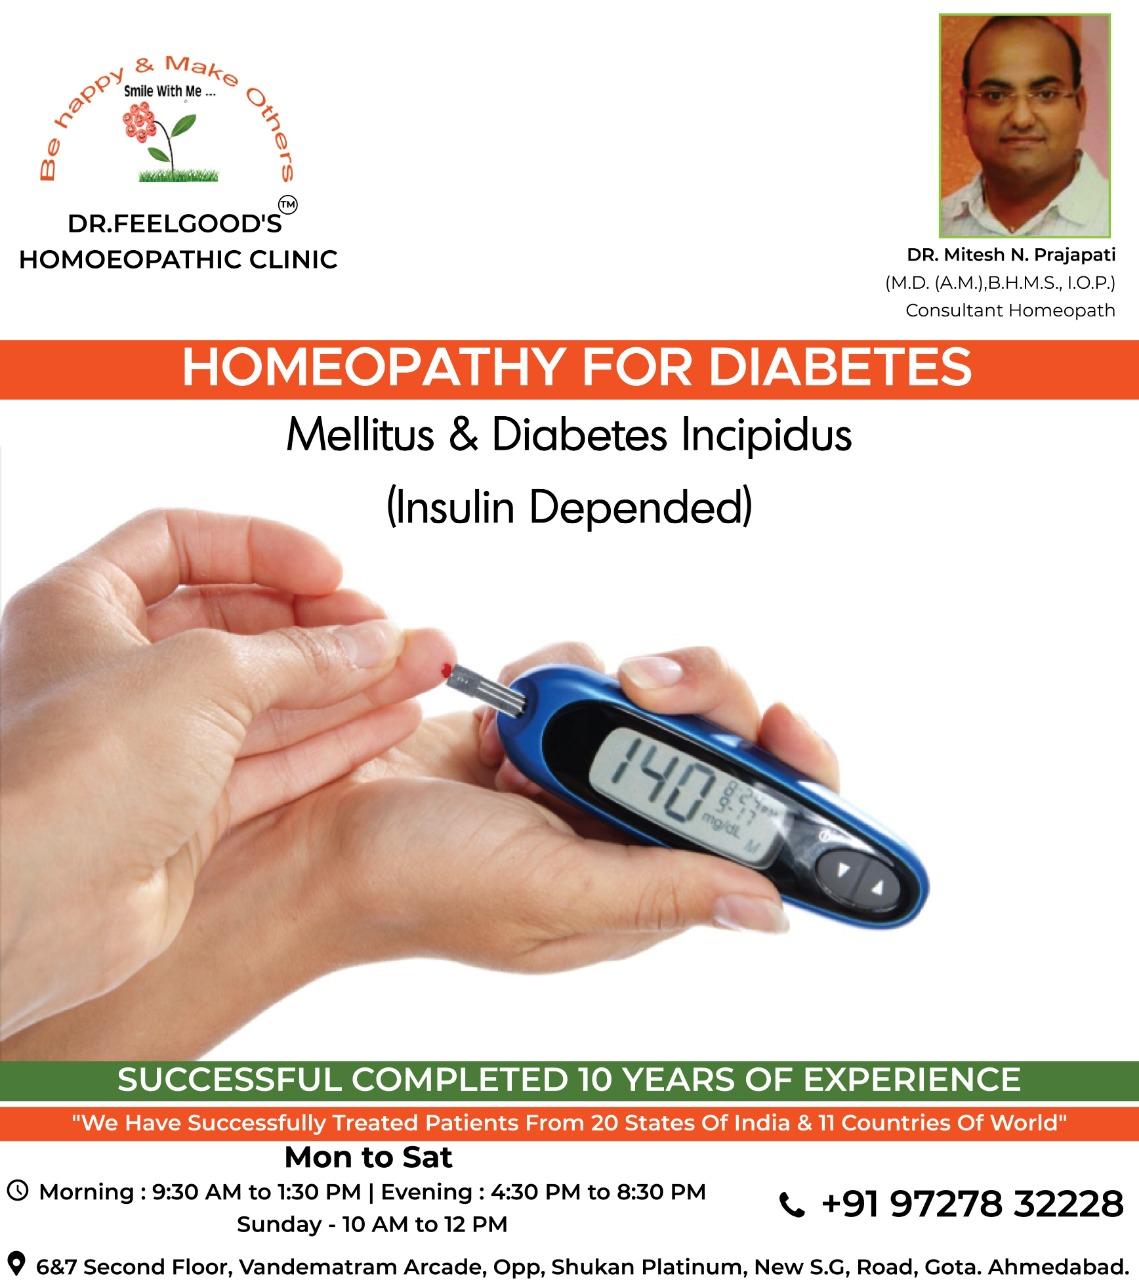 DR.MITESH PRAJAPATI- HOMEOPATHY FOR DIABETES (1)